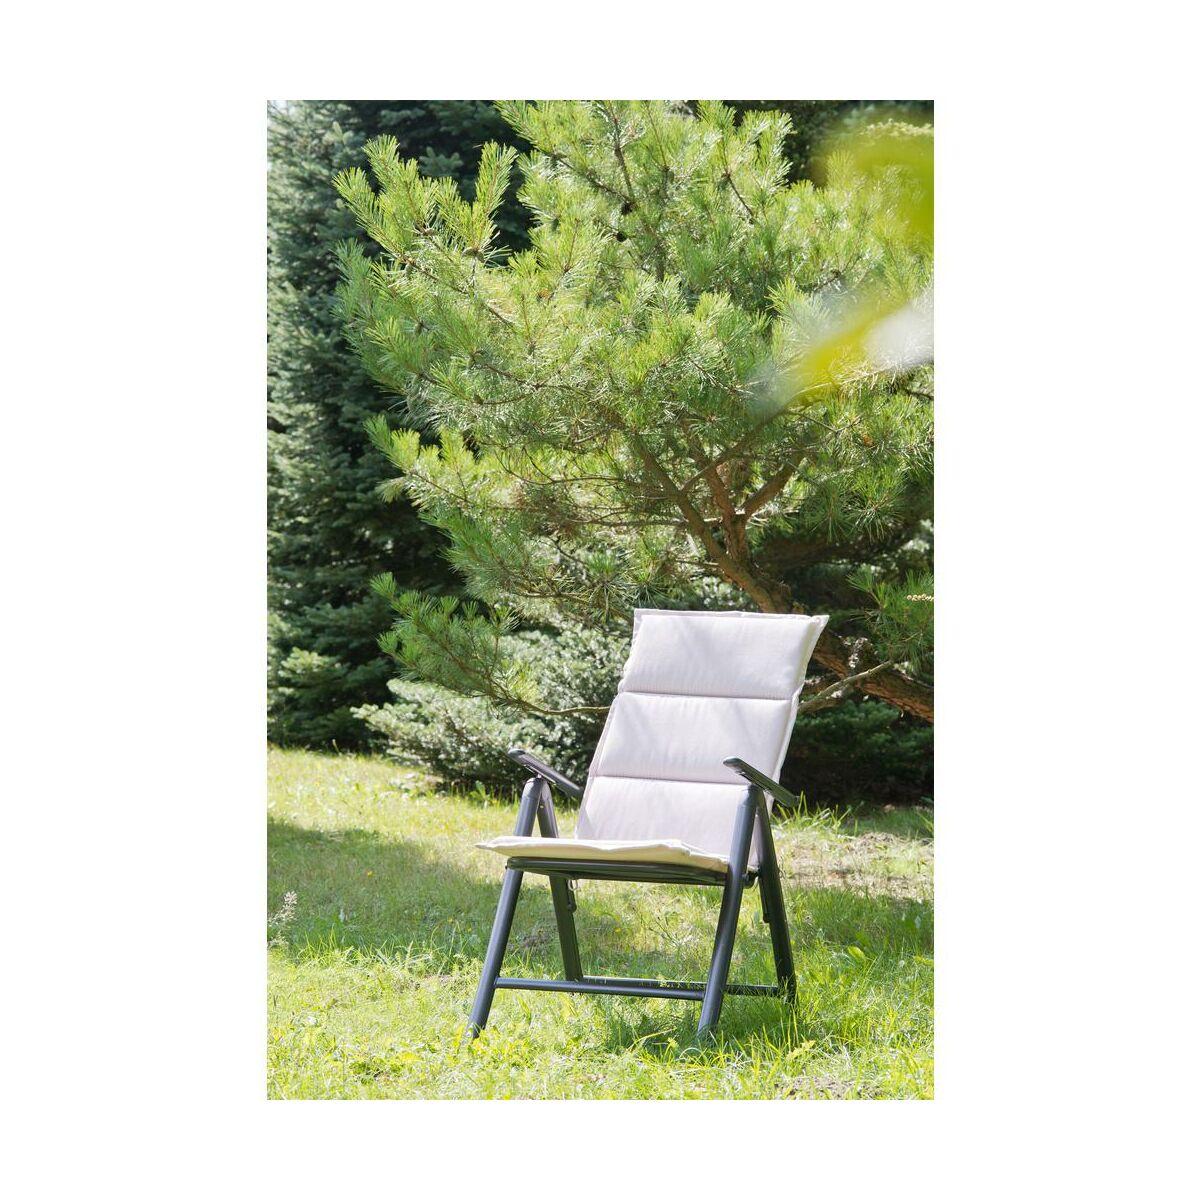 Poduszki Na Meble Ogrodowe Leroy Merlin : Leroy Merlin Ogród Relaks w ogrodzie Meble ogrodowe Poduszki na meble